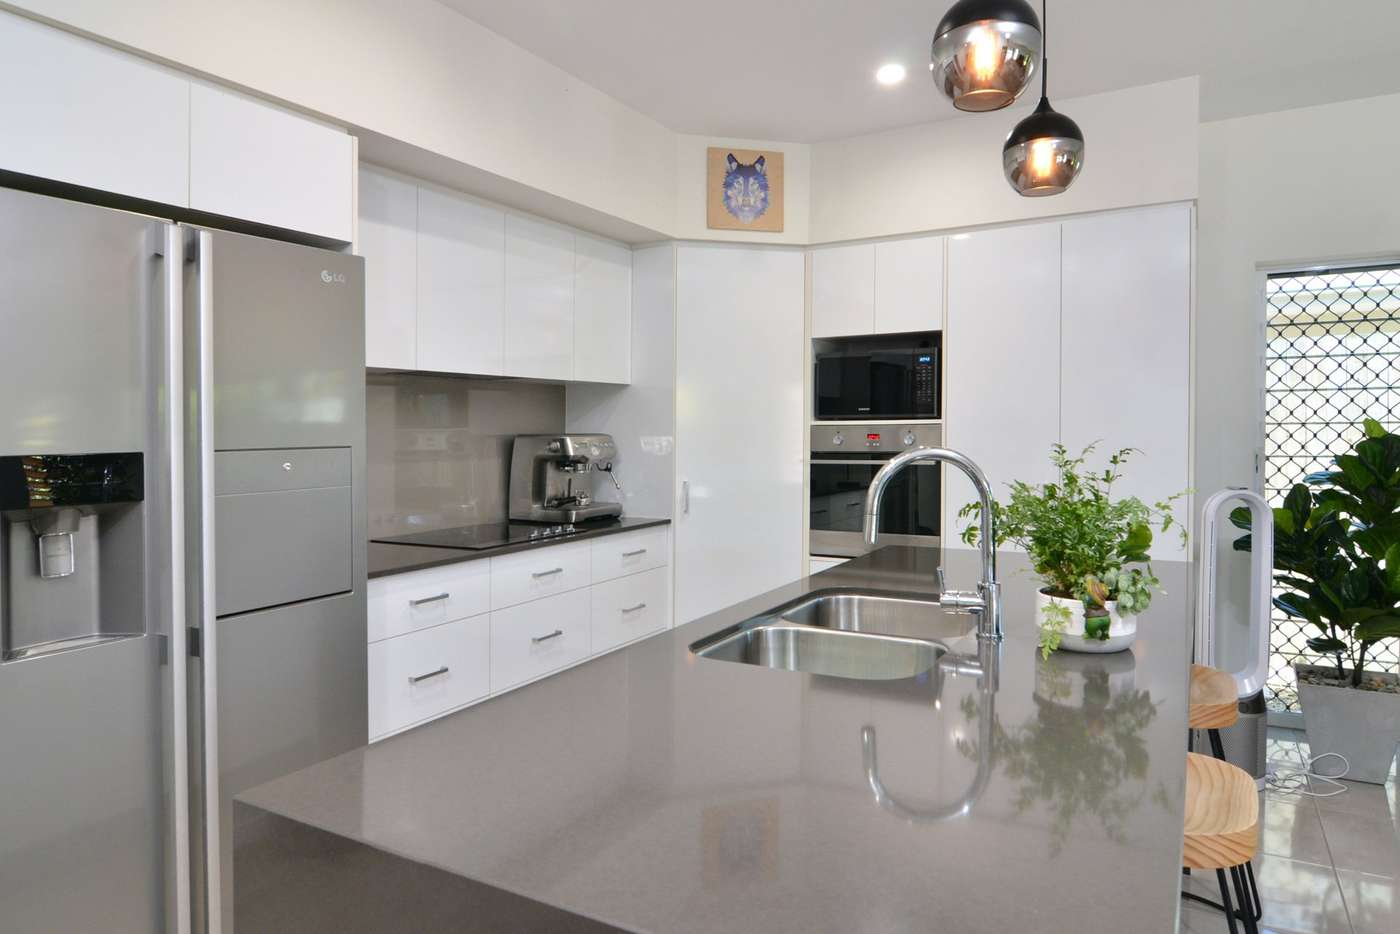 Main view of Homely house listing, 12 Julaji Close, Cooya Beach QLD 4873